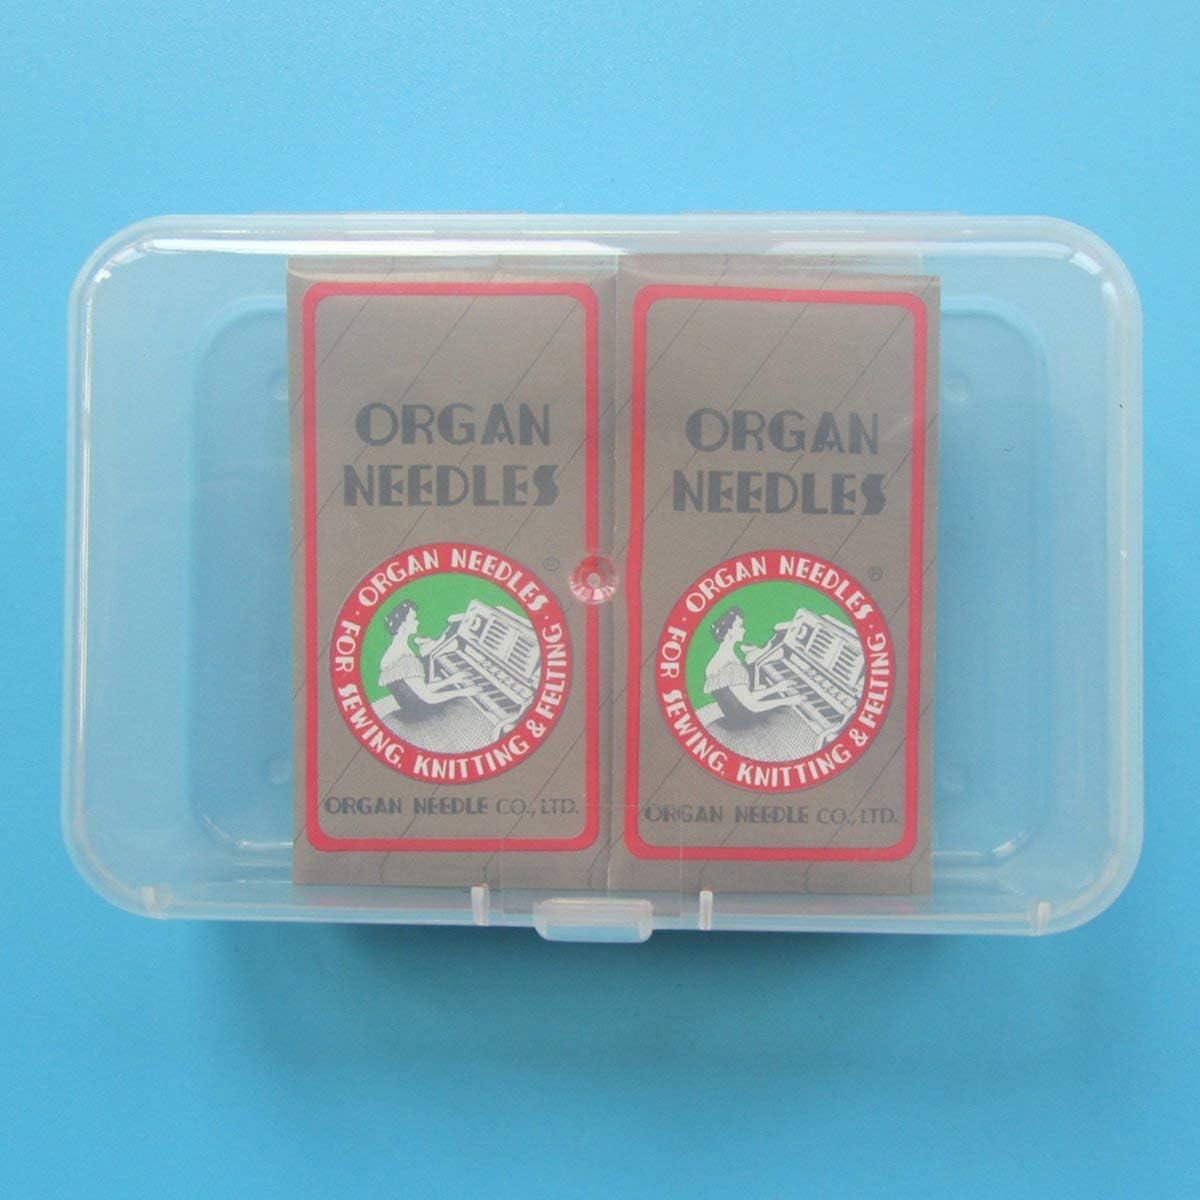 100 PCS Organ Sewing Needles fit for Singer RICCAR Organ-HAX1 14//90 100PCS NECCHI,Brother + Pfaff Organ Needle JANOME